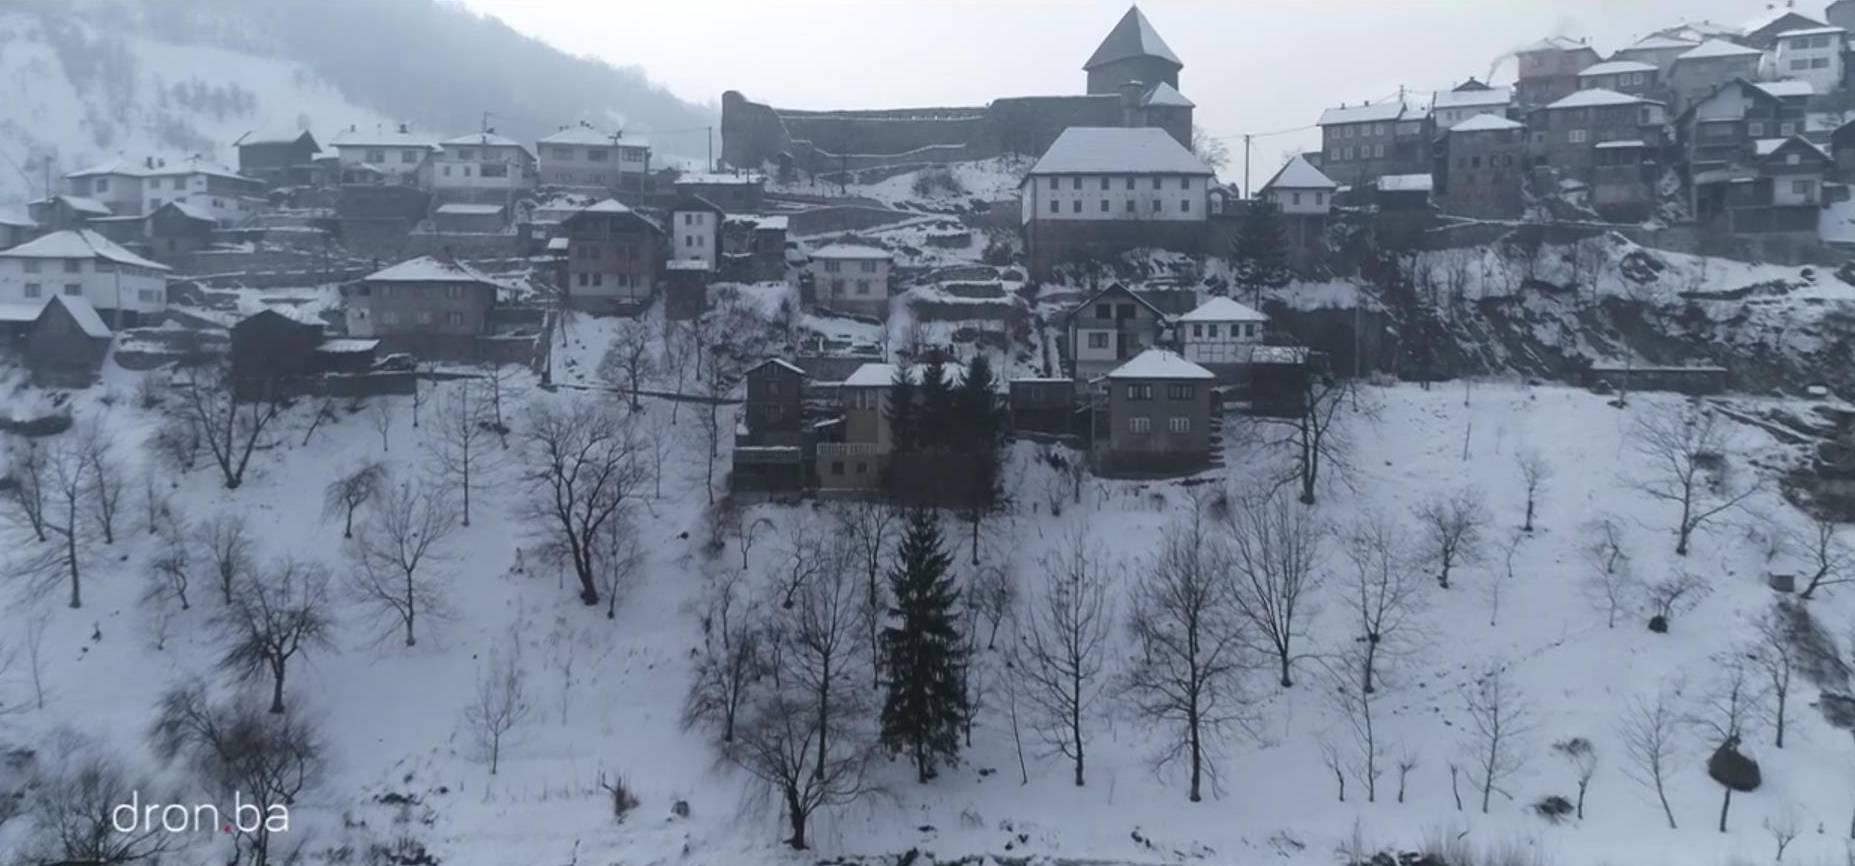 ... ba videoprodukcija i portal Zenicablog vam donose zimsku, januarsku